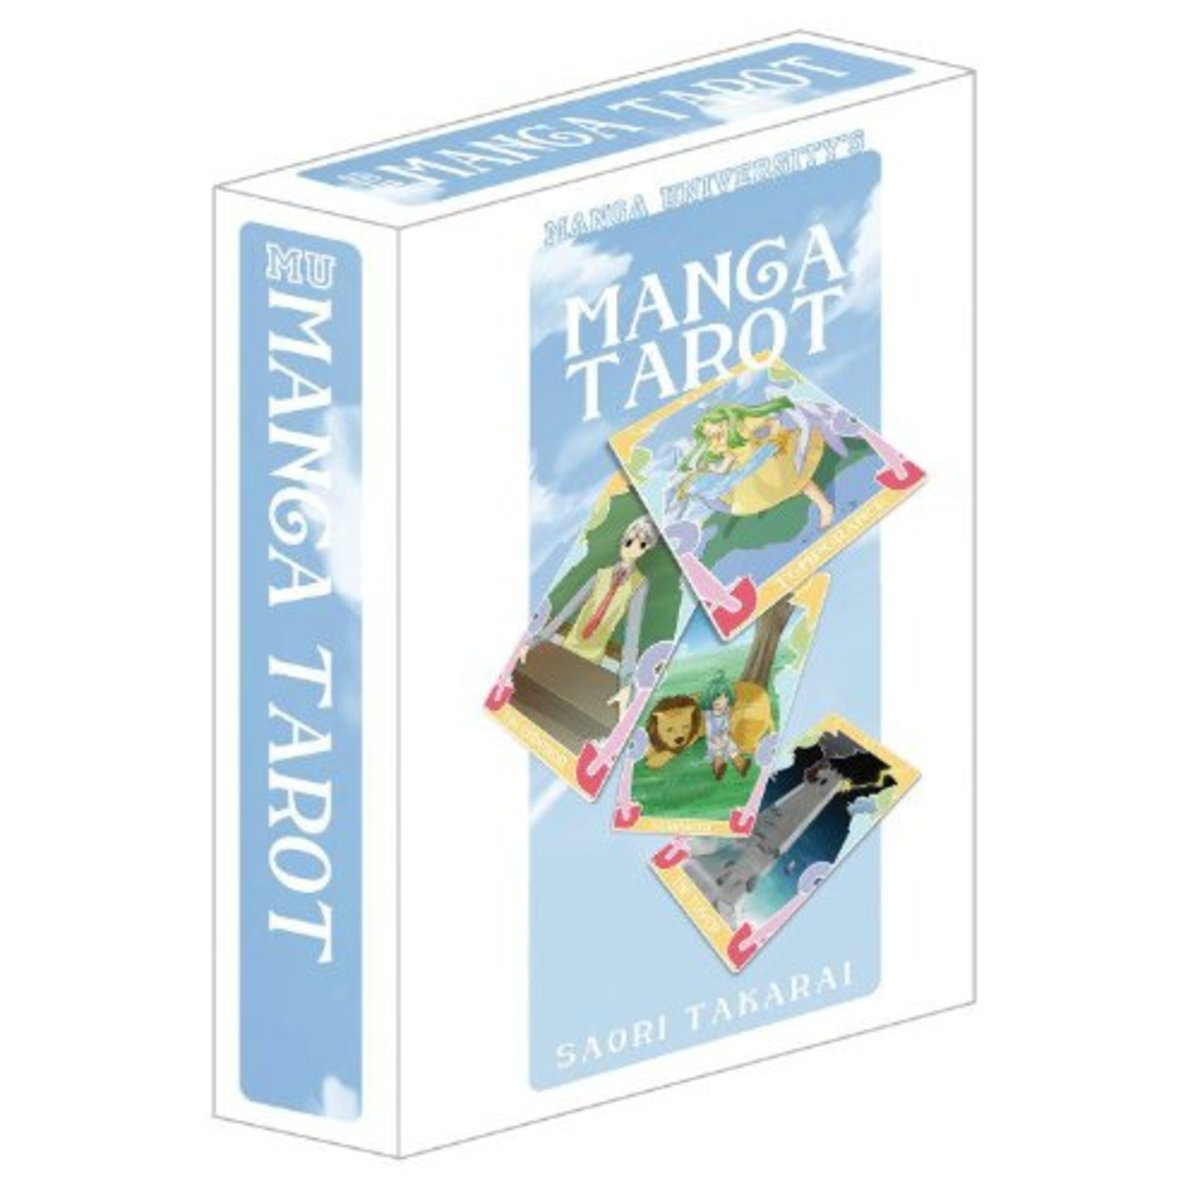 Manga University's Manga Tarot (Cards Plus Guidebook) by Saori Takarai